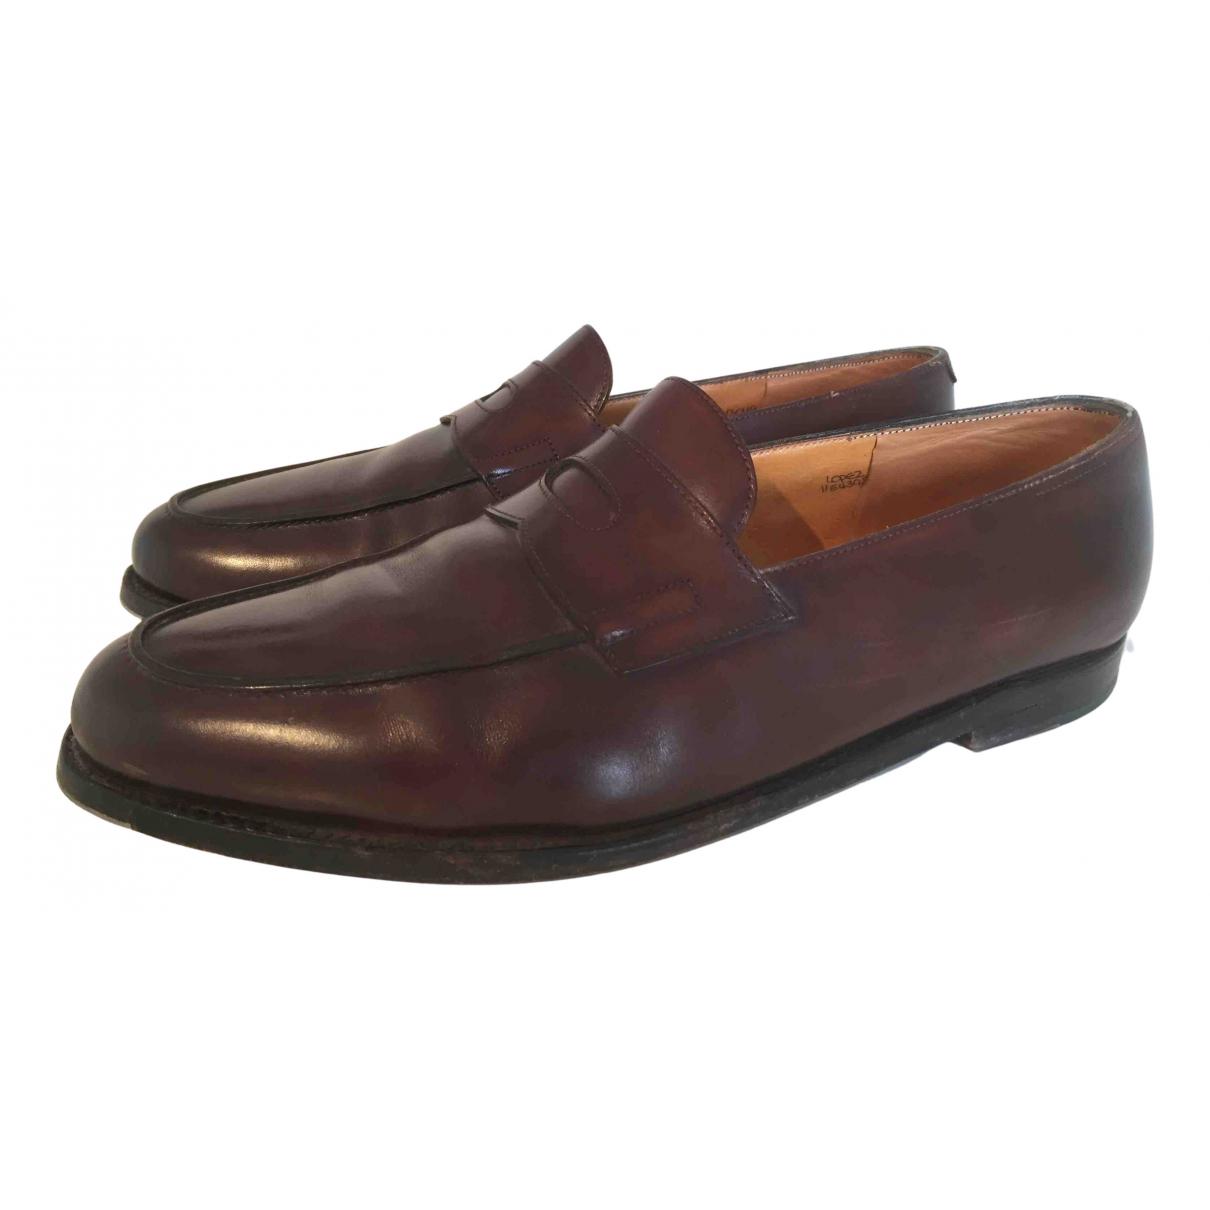 John Lobb N Brown Leather Flats for Men 44 EU